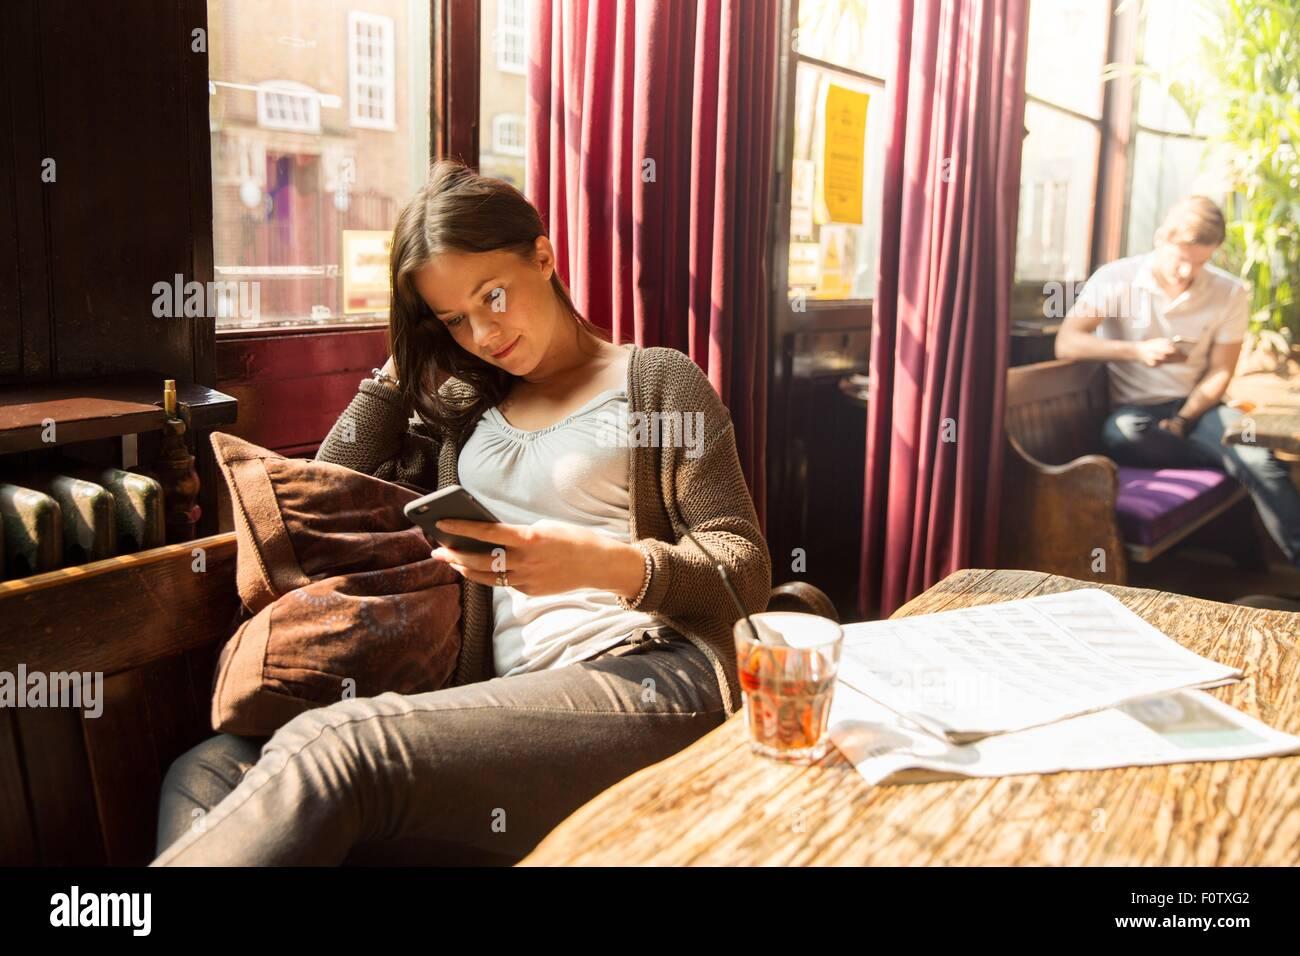 Mitte Erwachsene Frau sitzen Smartphone betrachten Stockfoto